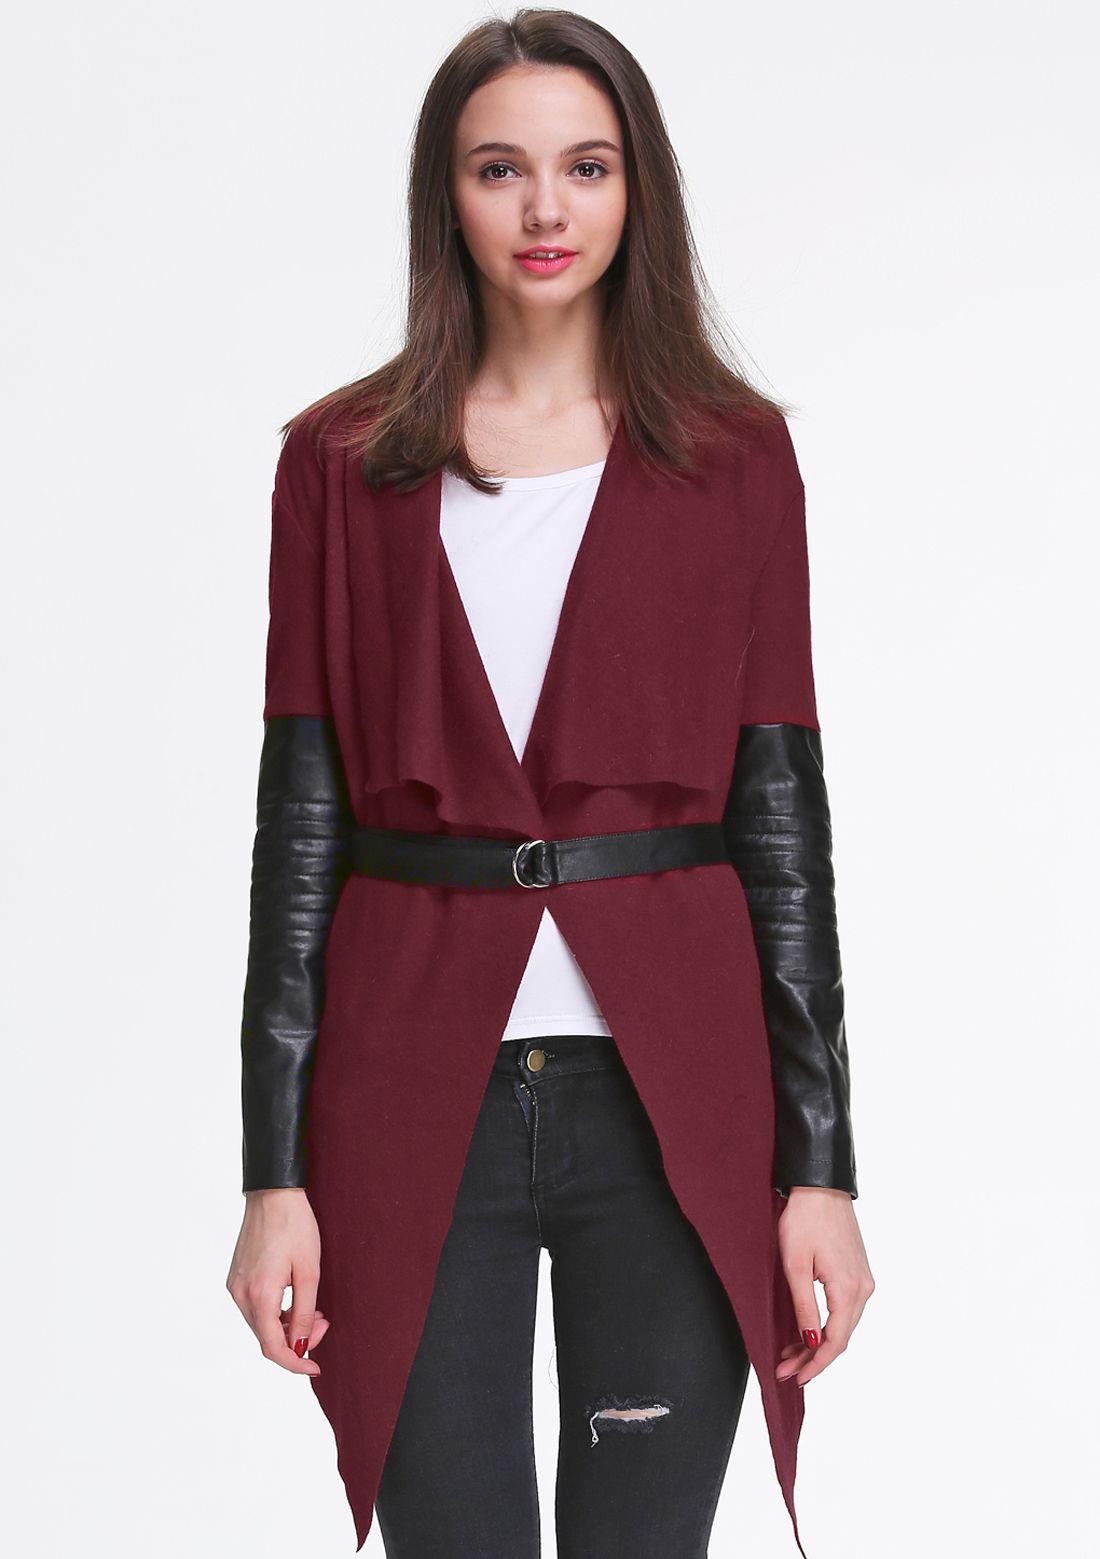 Wine Red Contrast Pu Leather Asymmetric Belt Outerwear Outerwear Wine Red Pu Leather